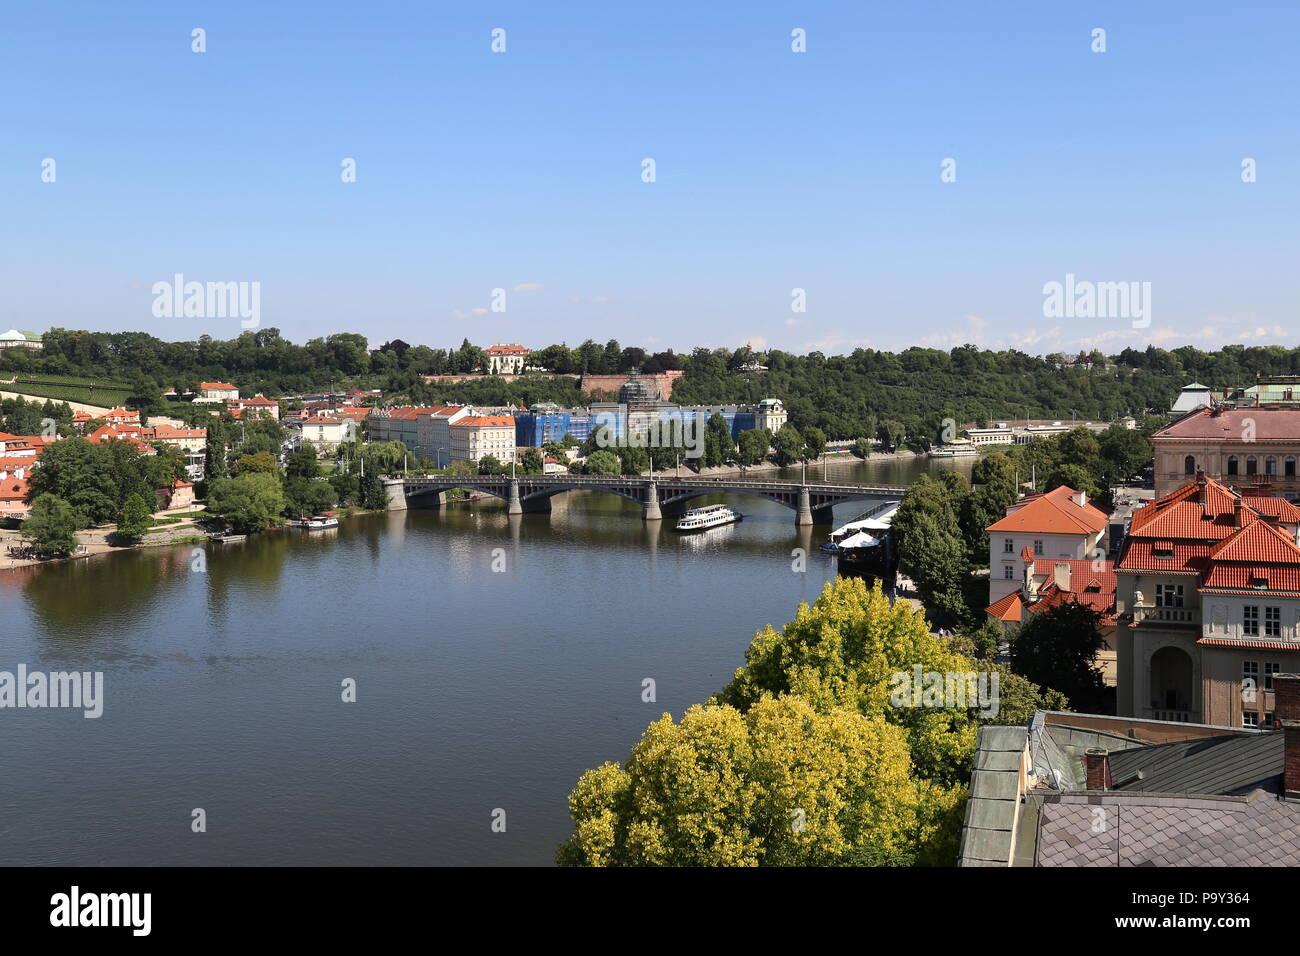 View of Vltava river from Old Town Bridge Tower, Prague, Czechia (Czech Republic), Europe - Stock Image